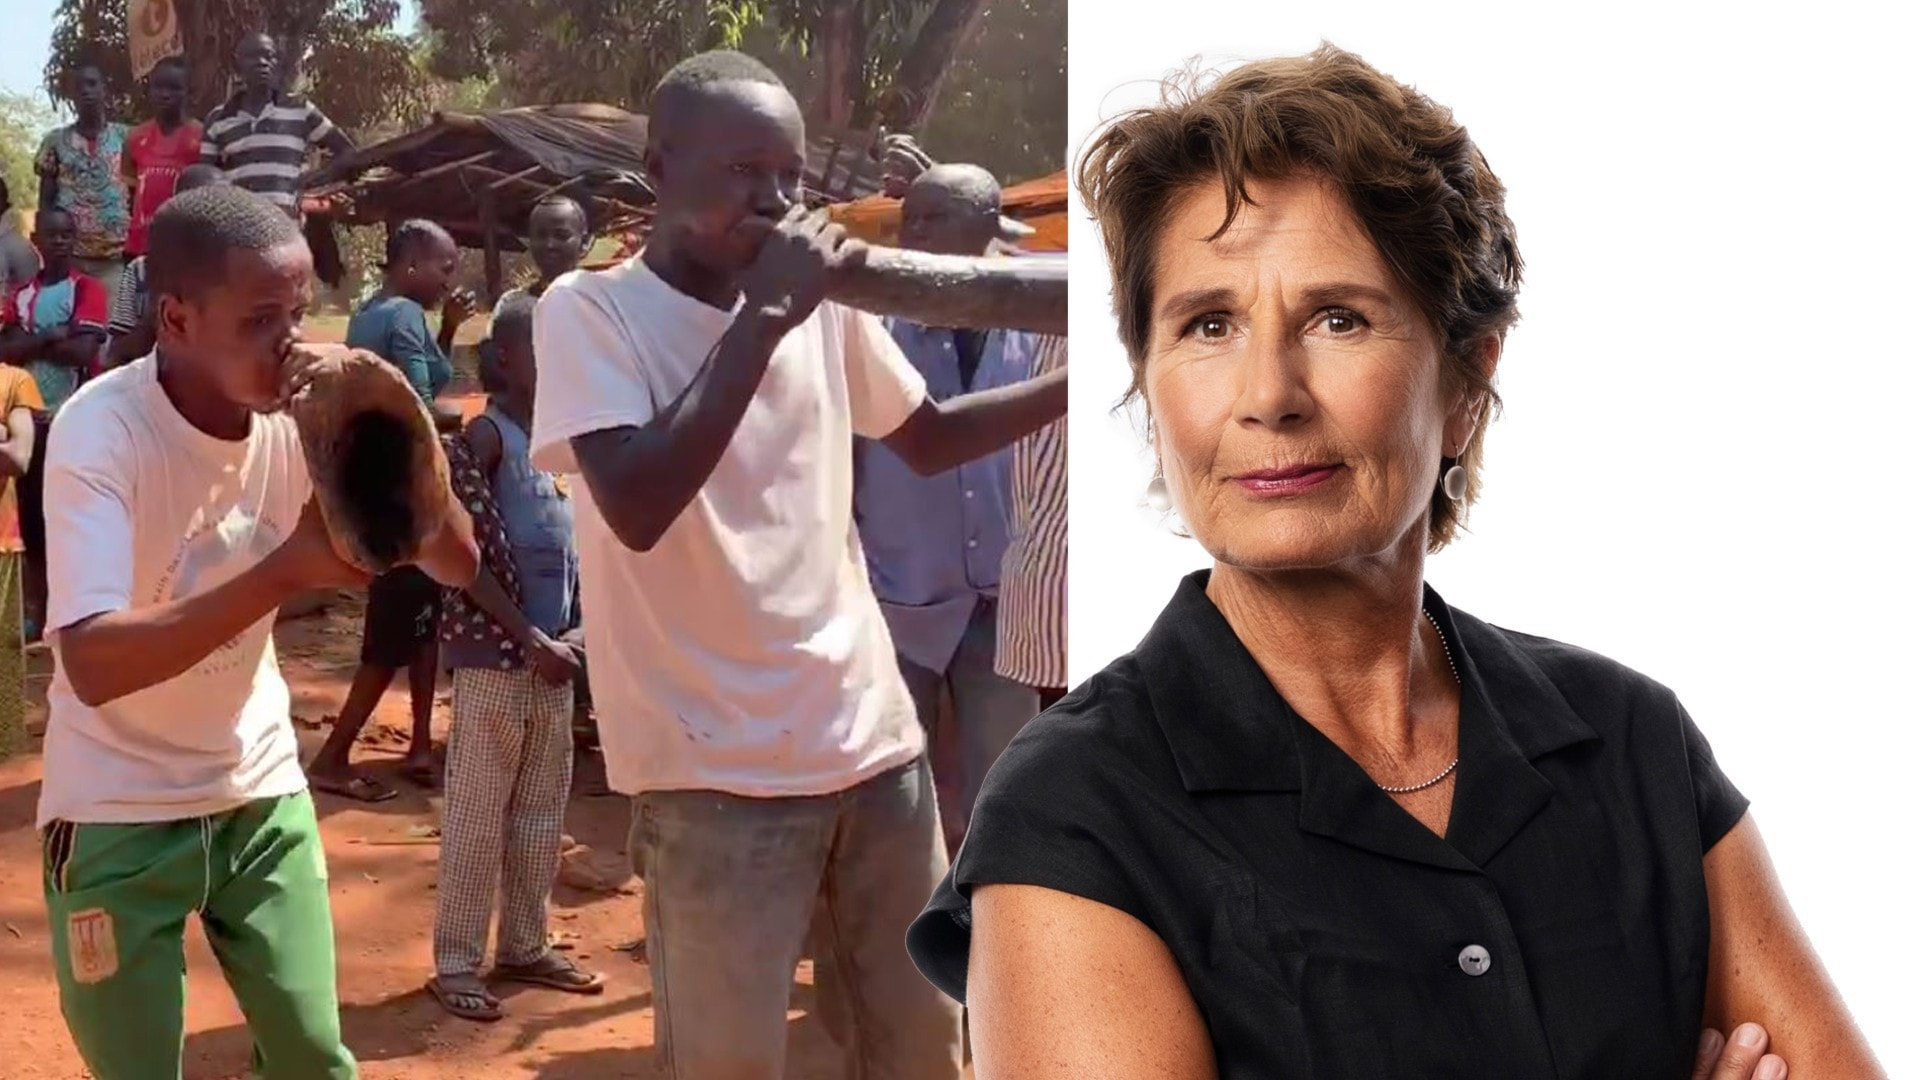 Undanskymda platser: Alice Petrén, migrationskorrespondent